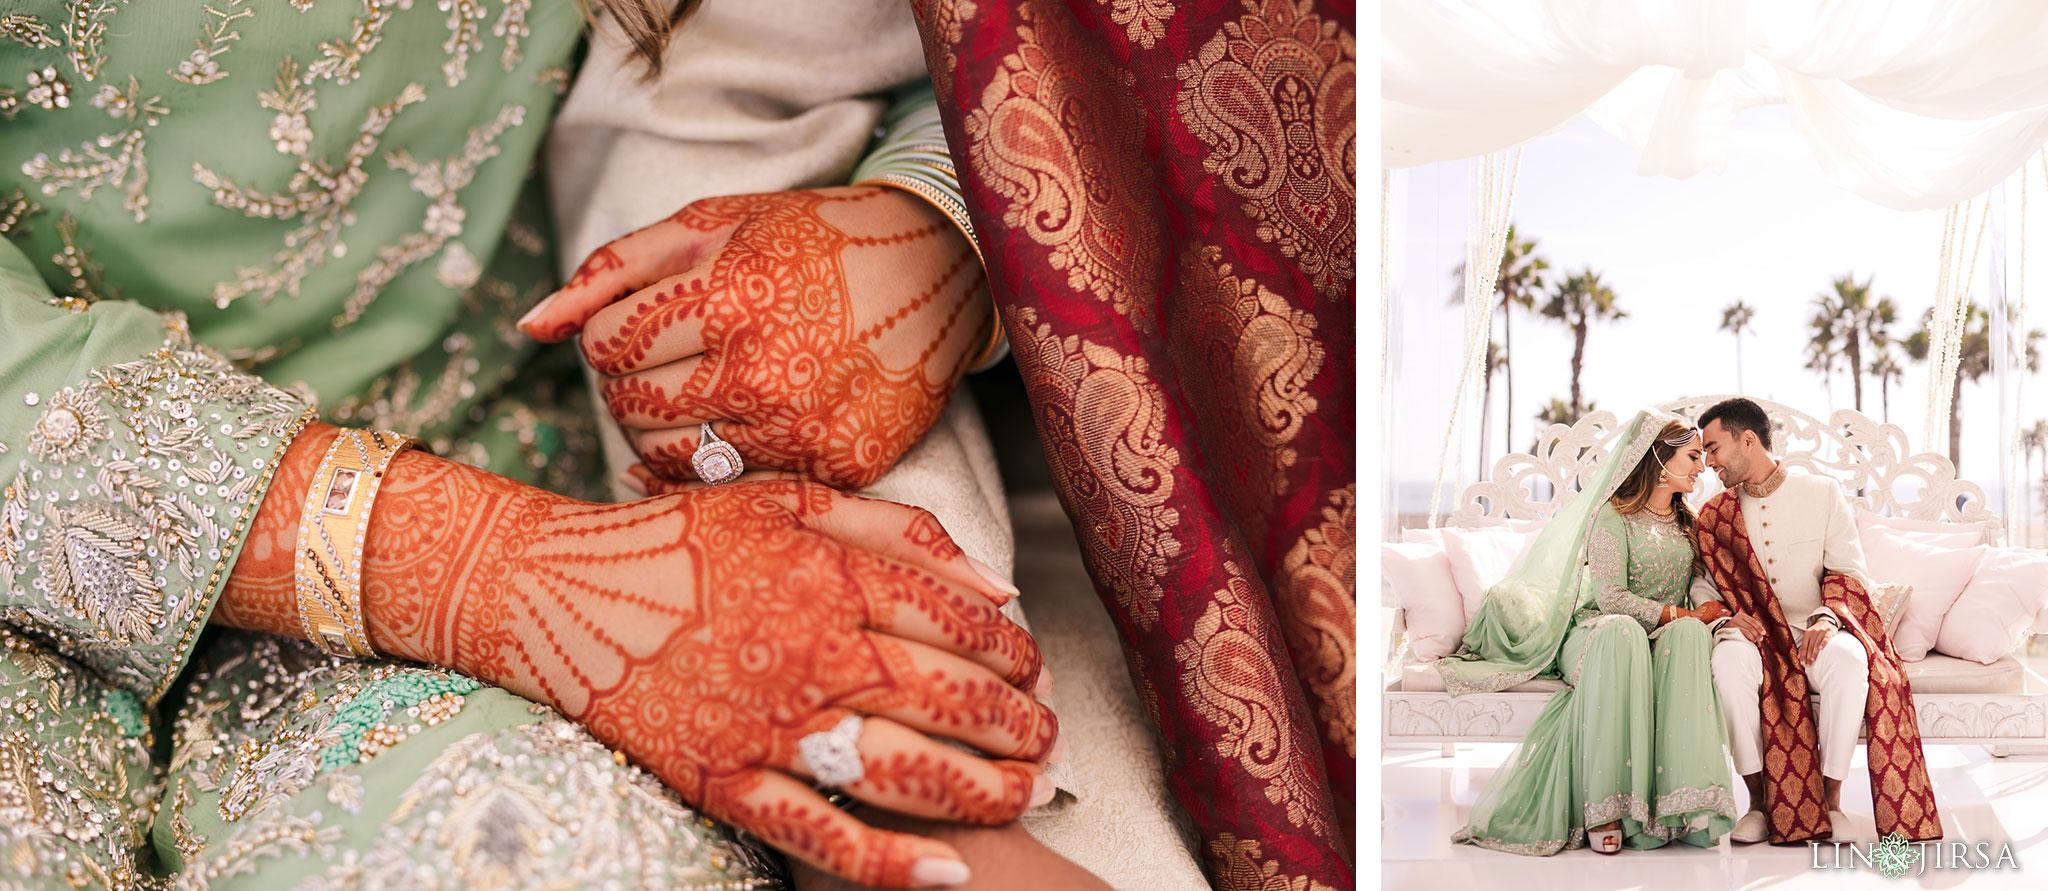 025 pasea hotel huntington beach pakistani muslim wedding photography